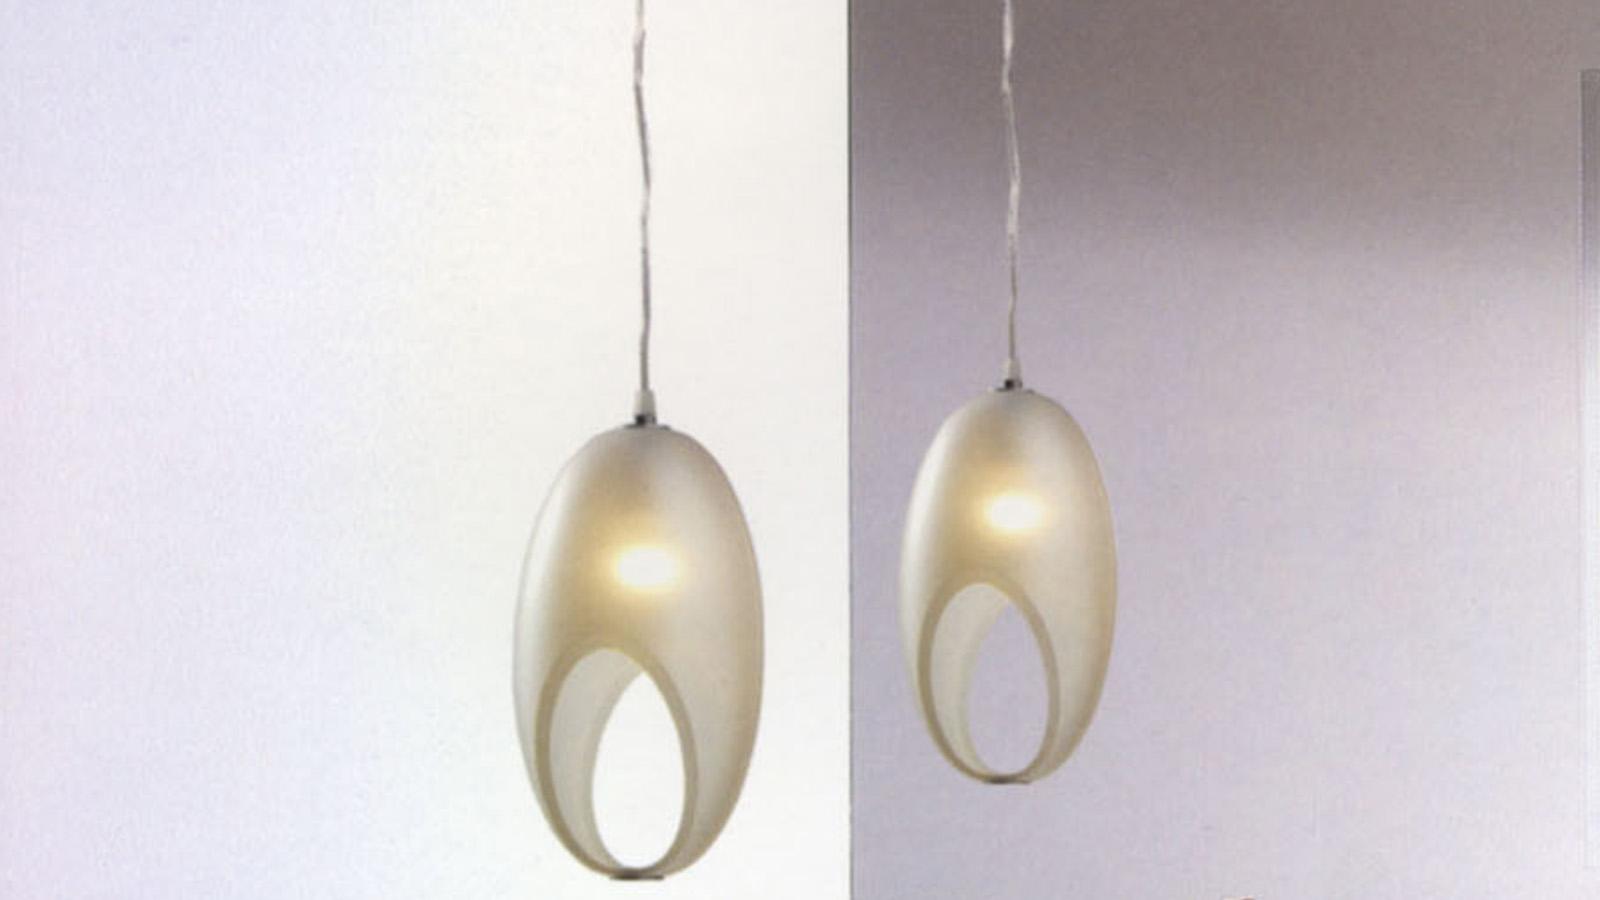 mgl-ovo-lamp-anteprima